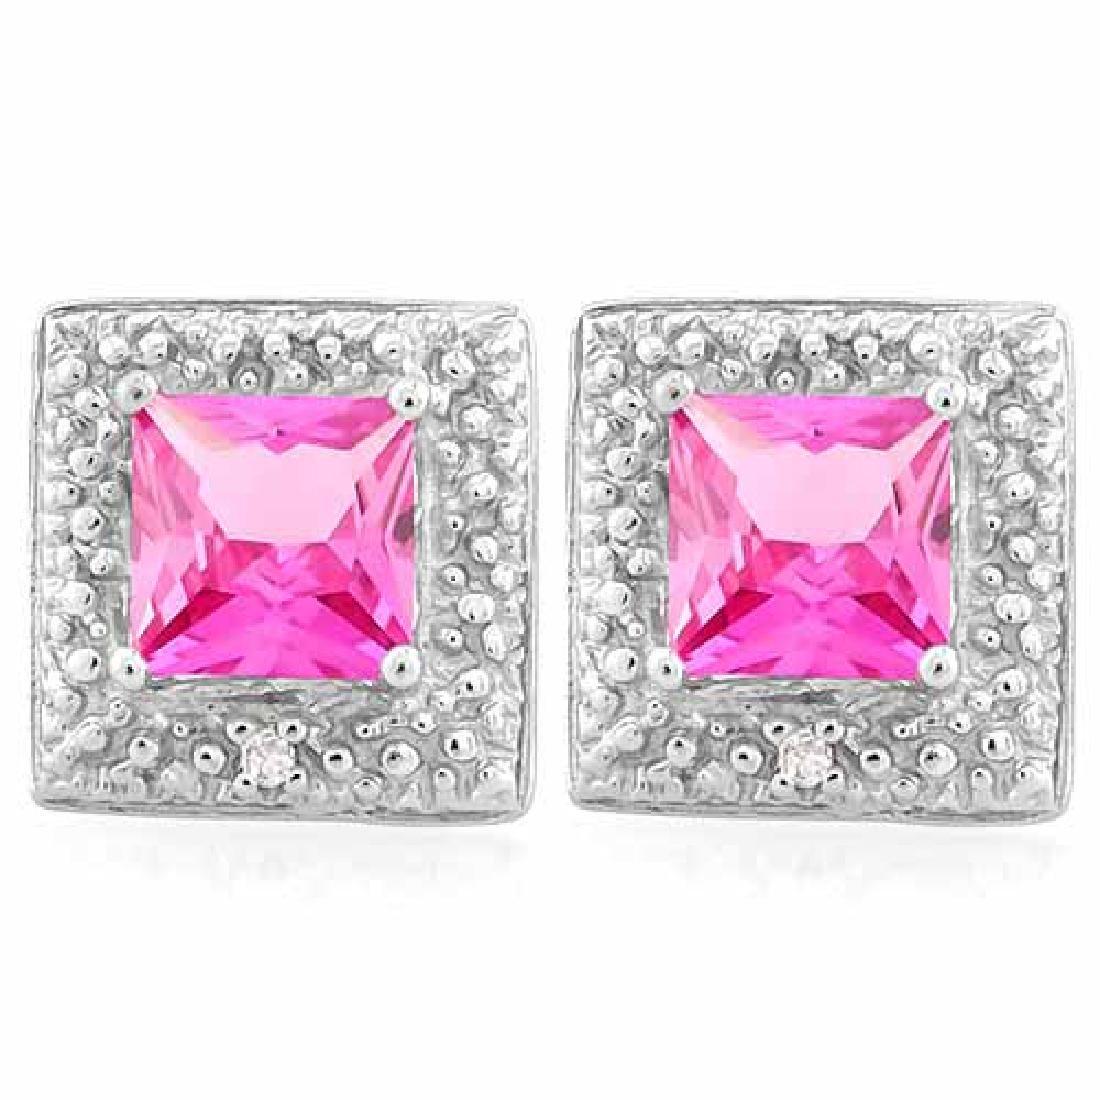 1 1/2 CARAT CREATED PINK SAPPHIRE & DIAMOND 925 STERLIN